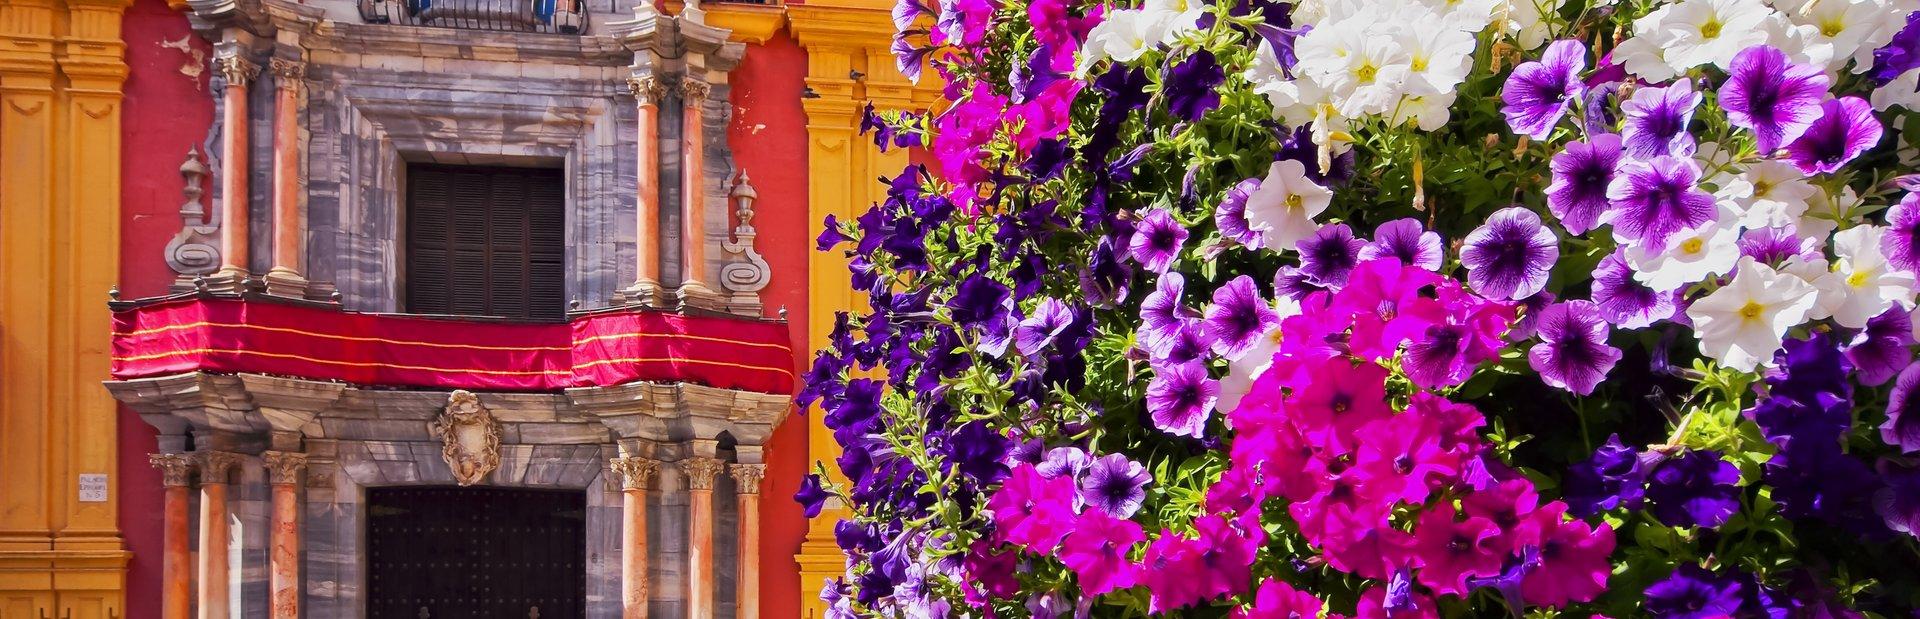 Spain guide